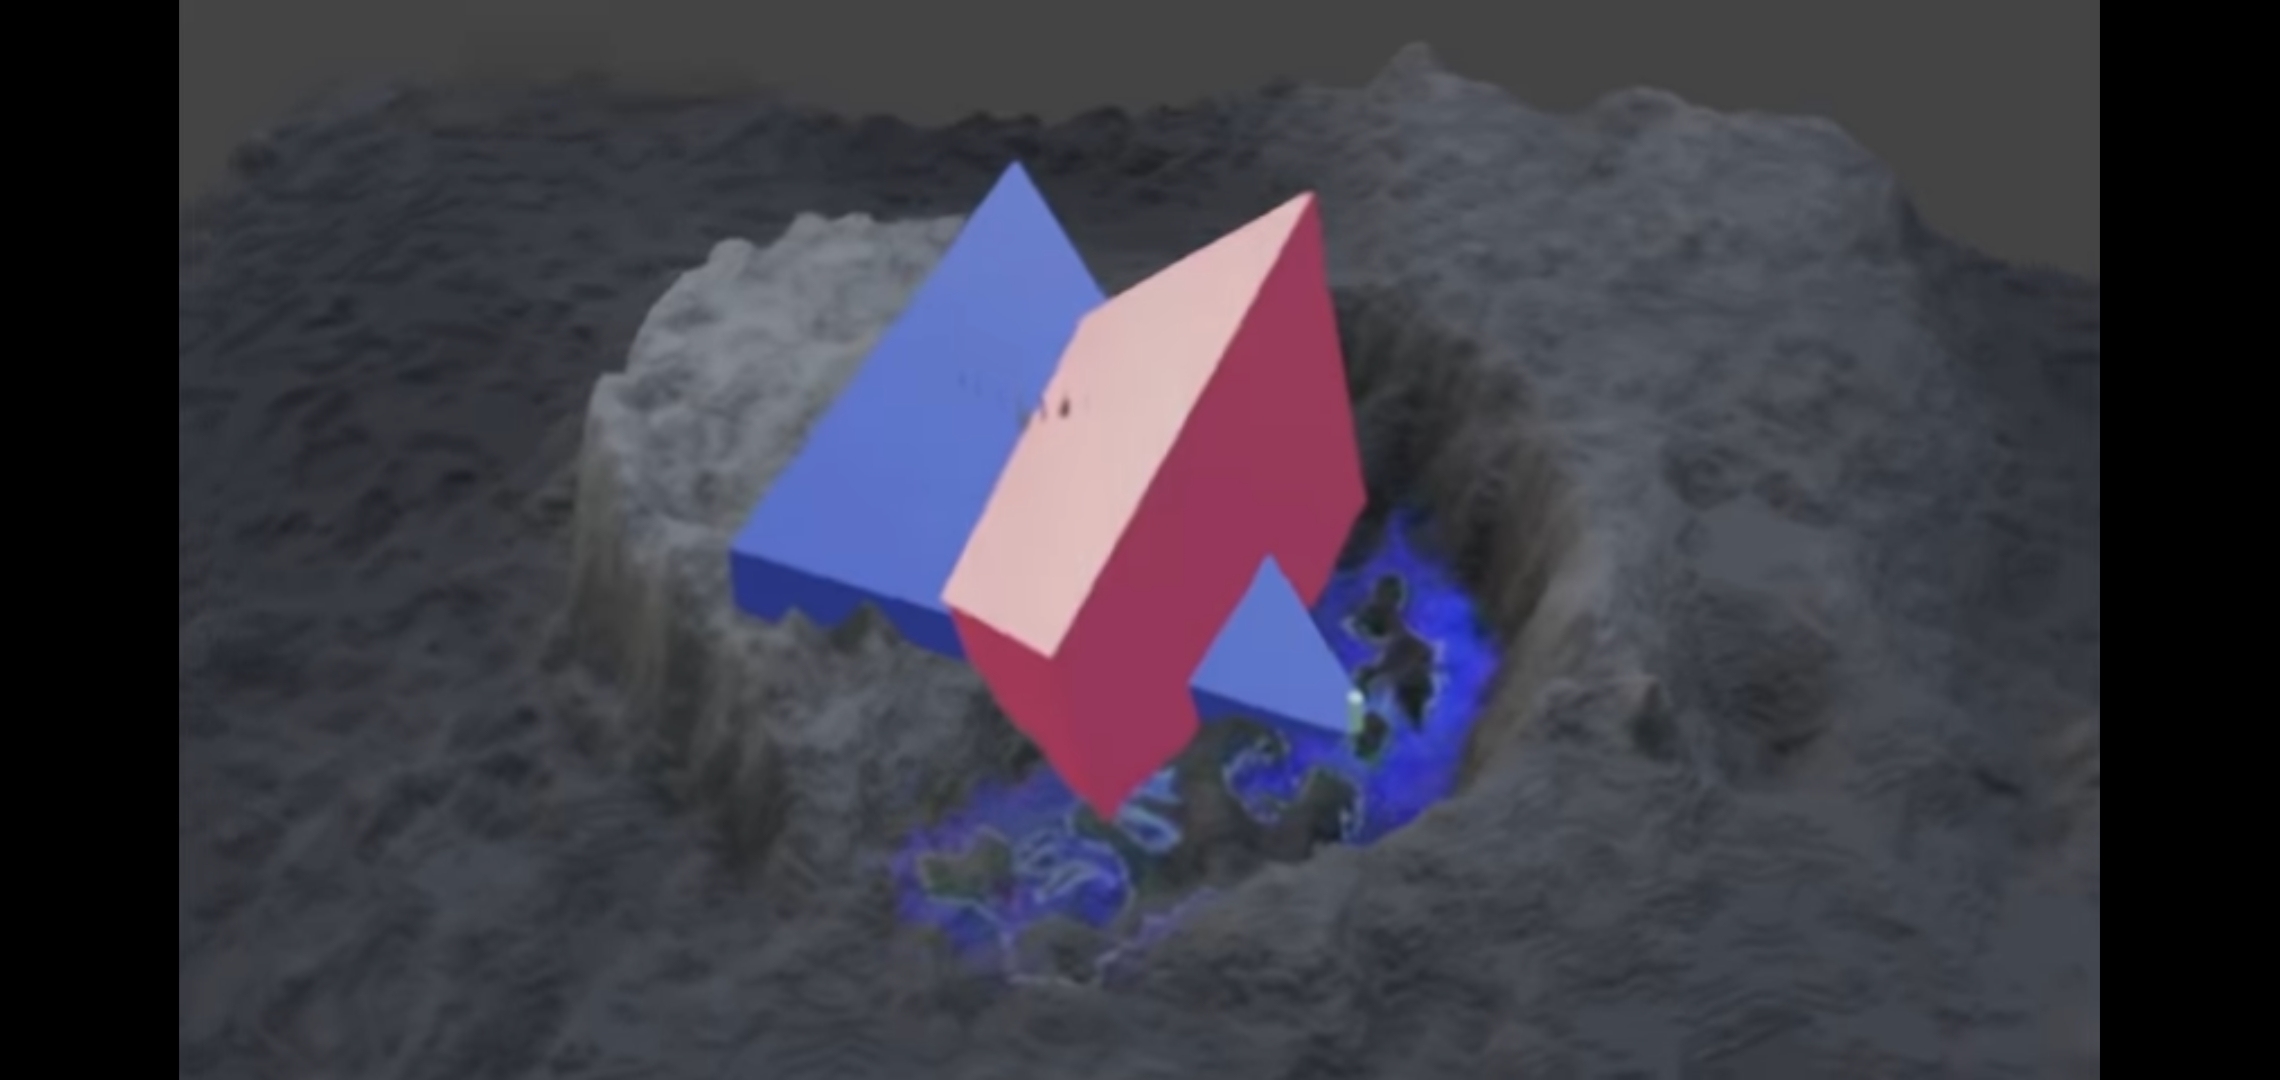 CounterRotatingPyramidsMetatronsCubeMerkaba.jpg